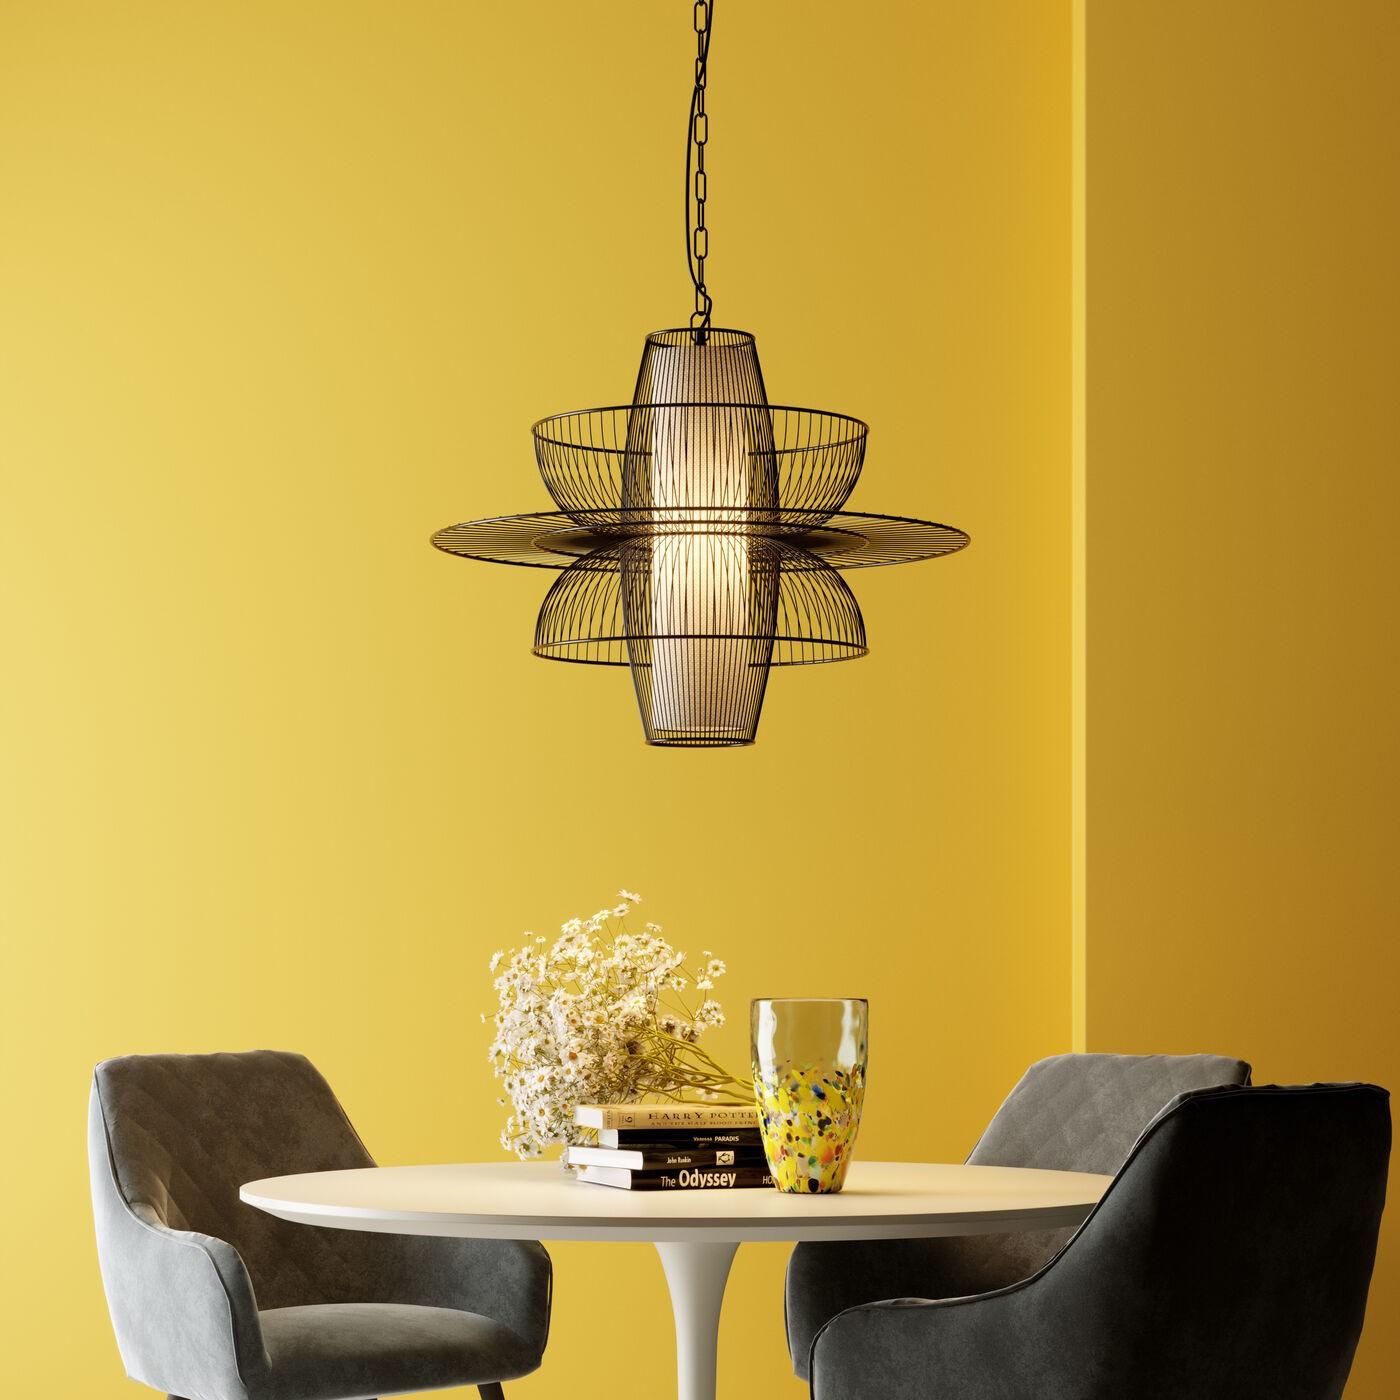 Table Invitation chêne & blanche Kare Design Diamètre - 90cm